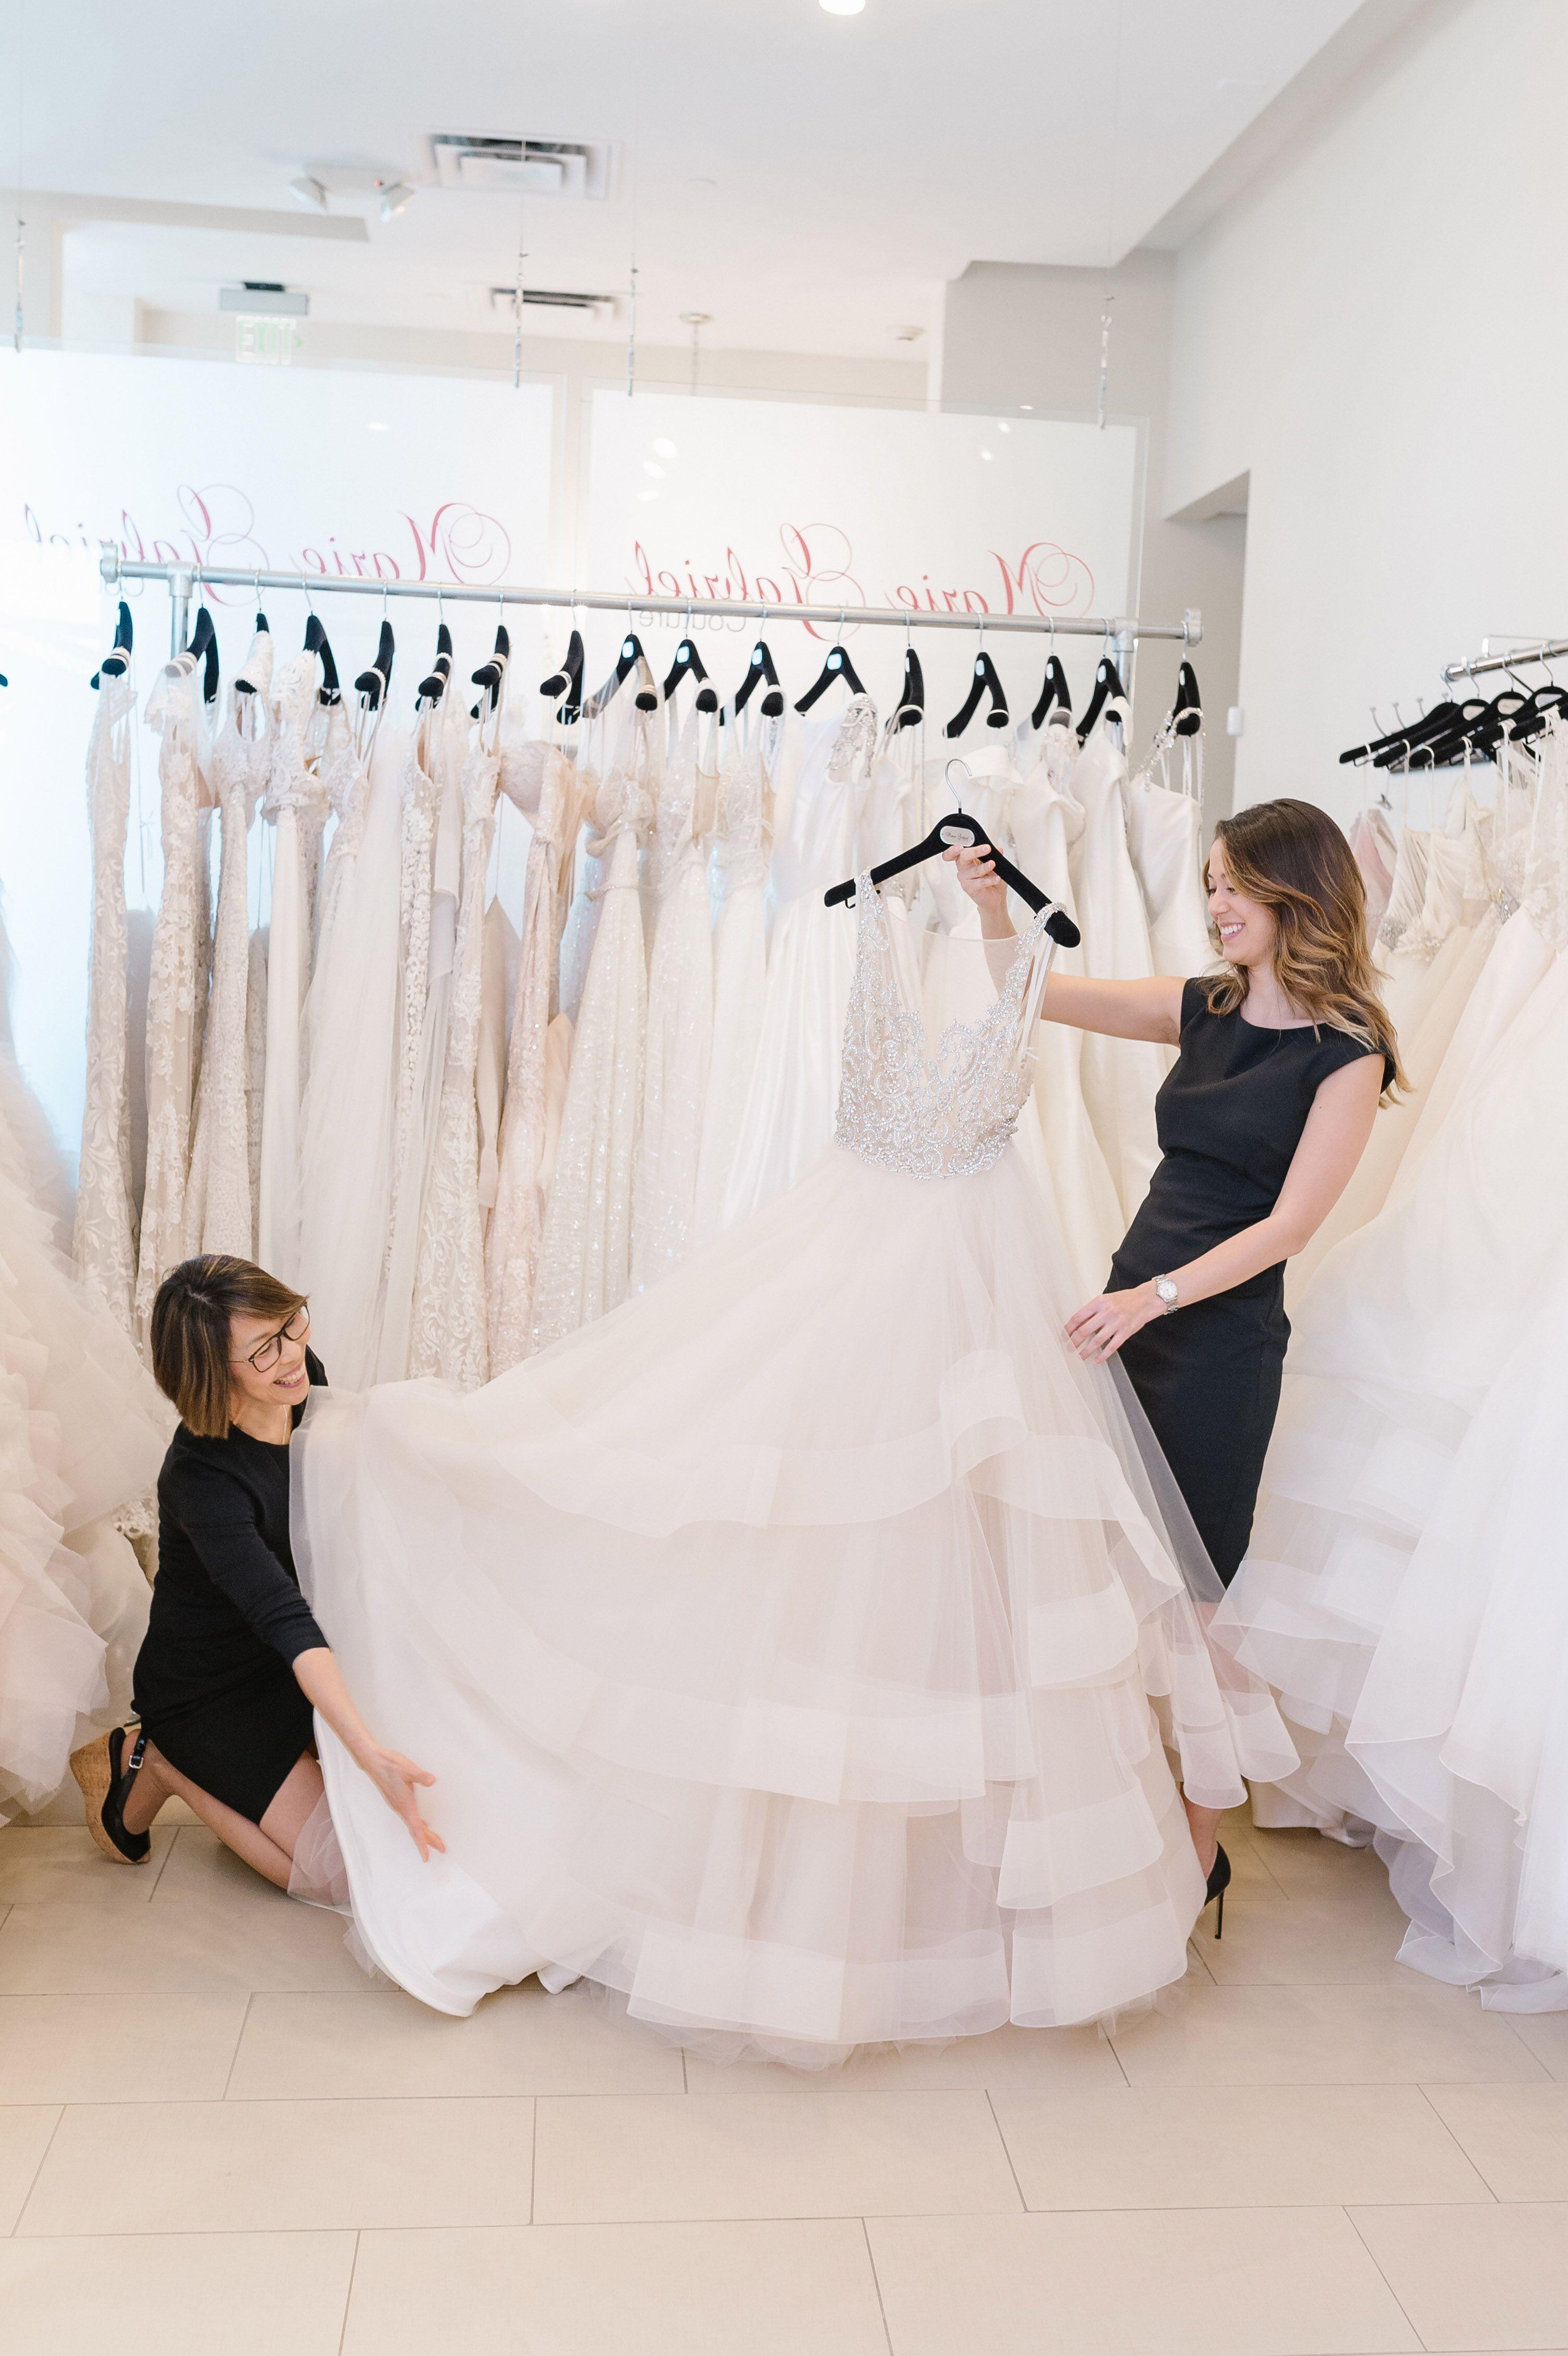 Bridal Salons in Cincinnati, OH - The Knot